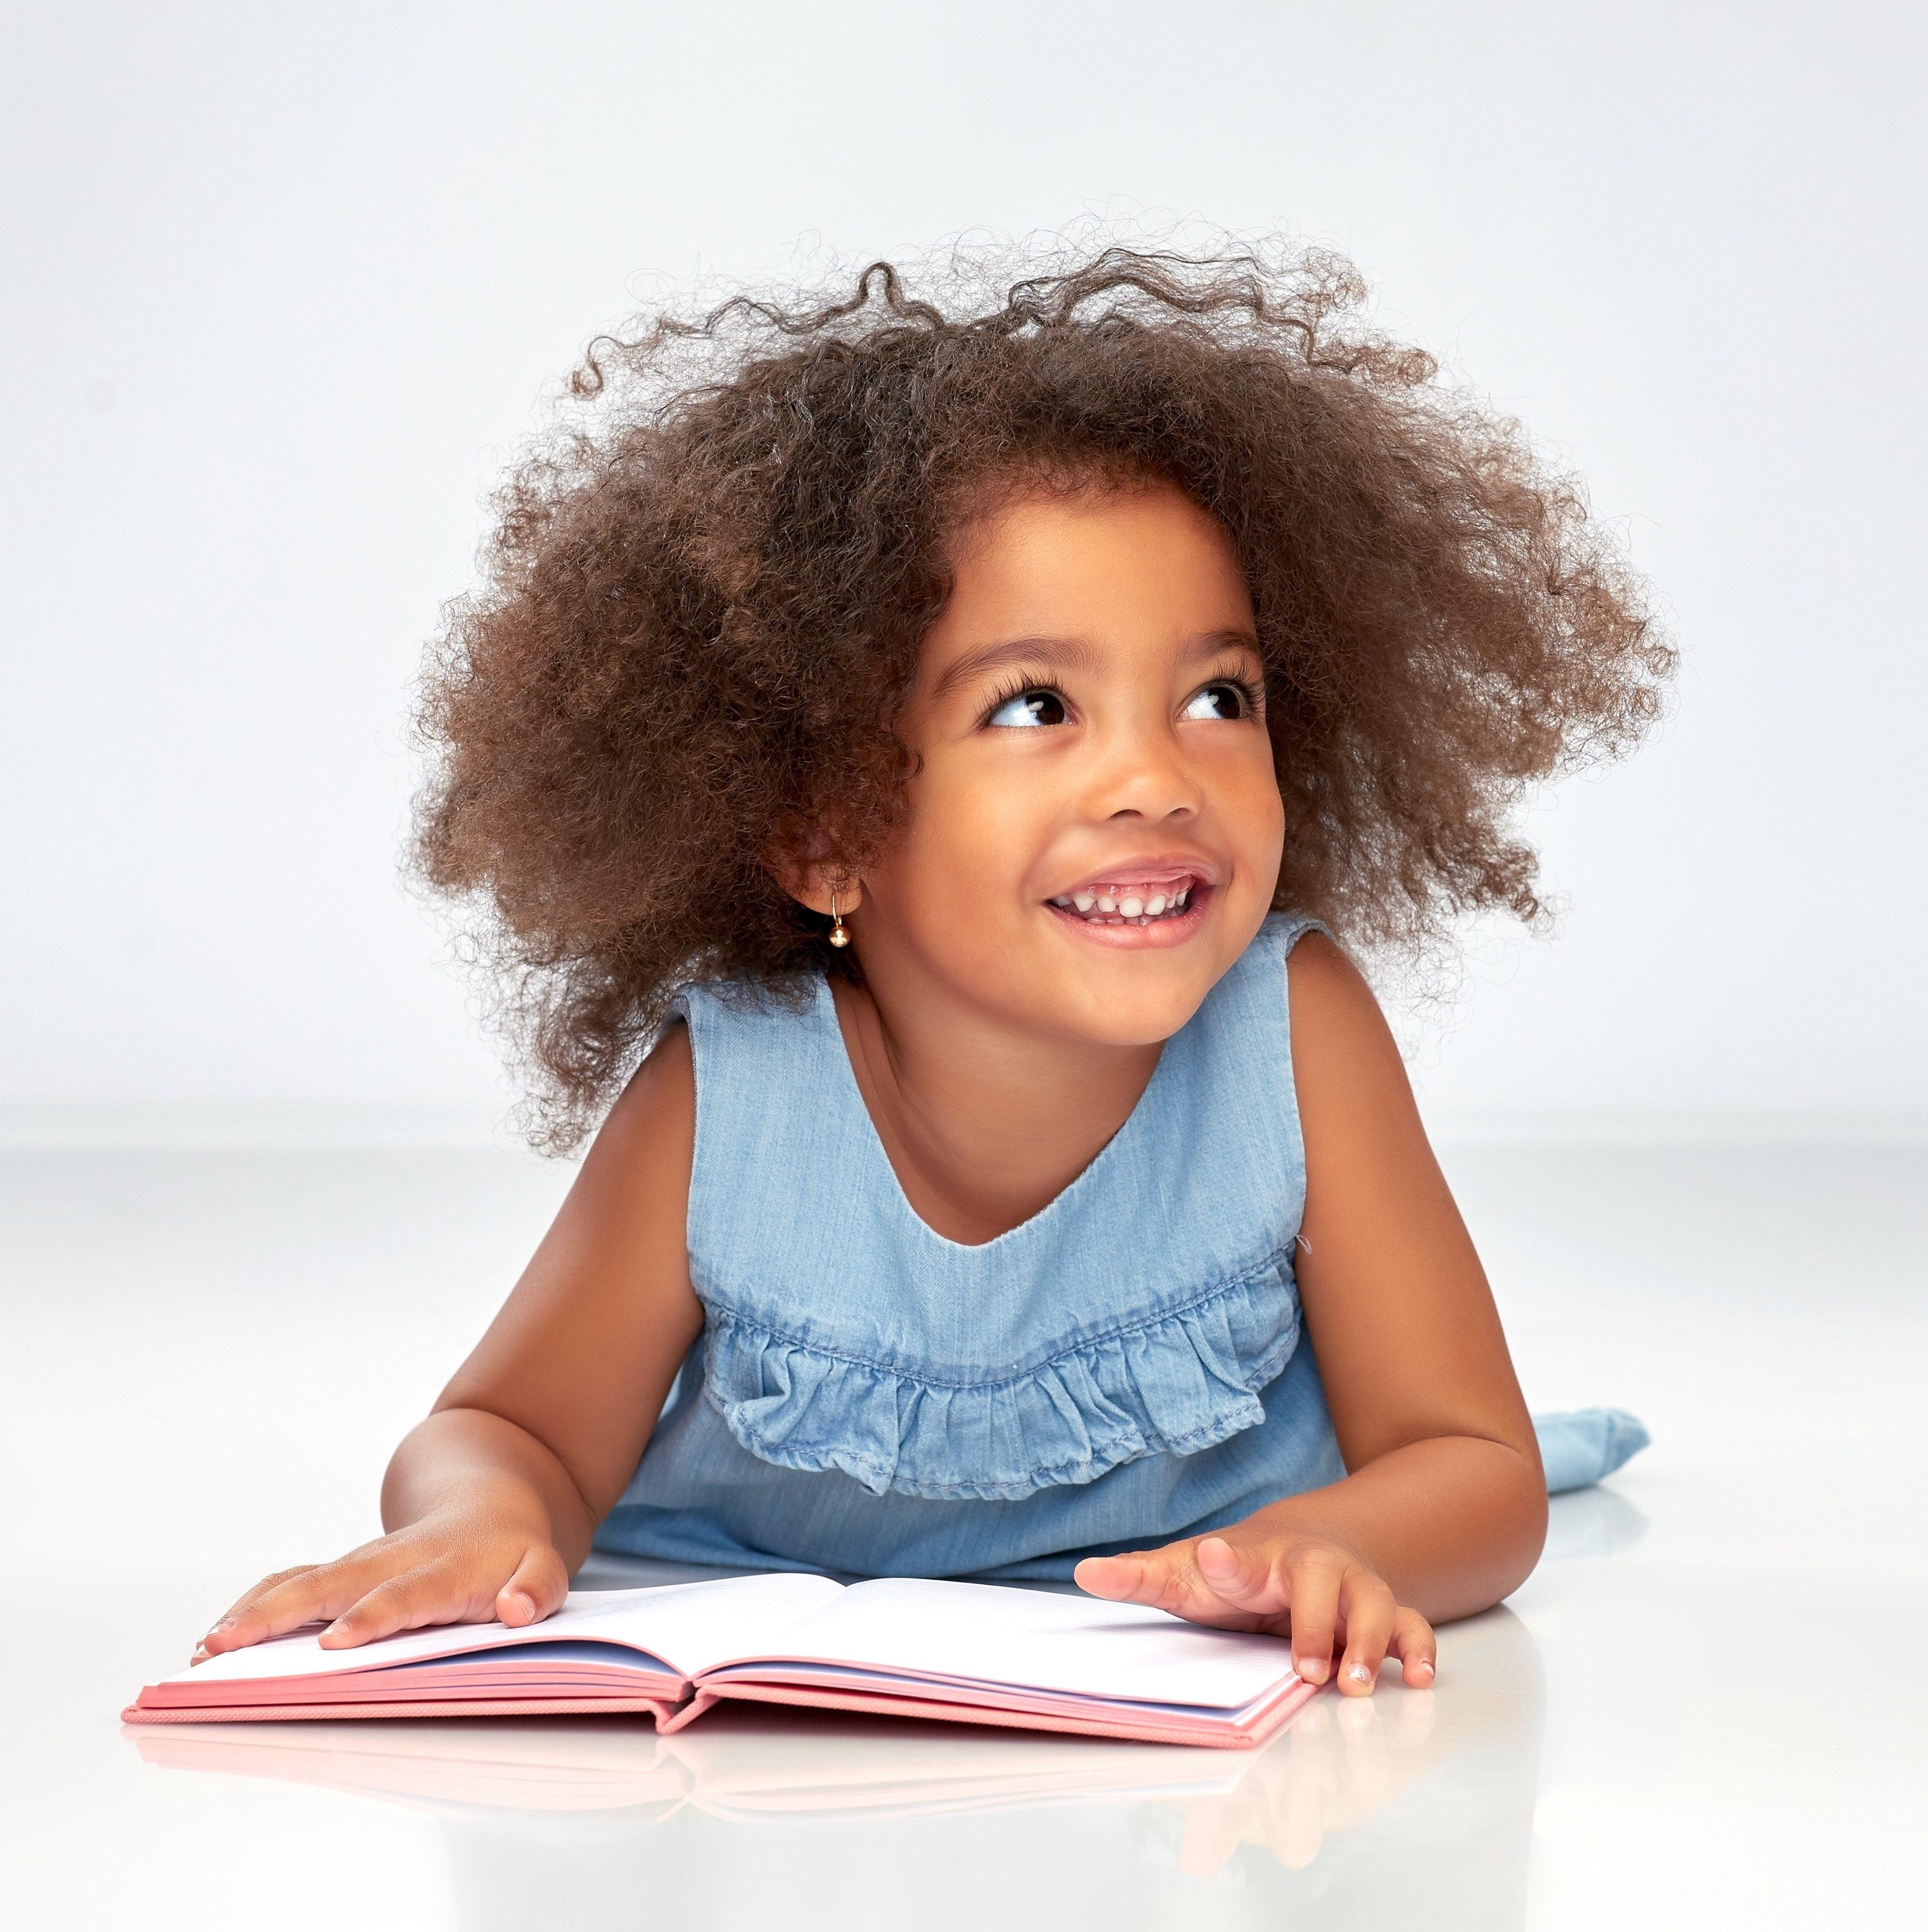 When Do Kids Start Preschool?